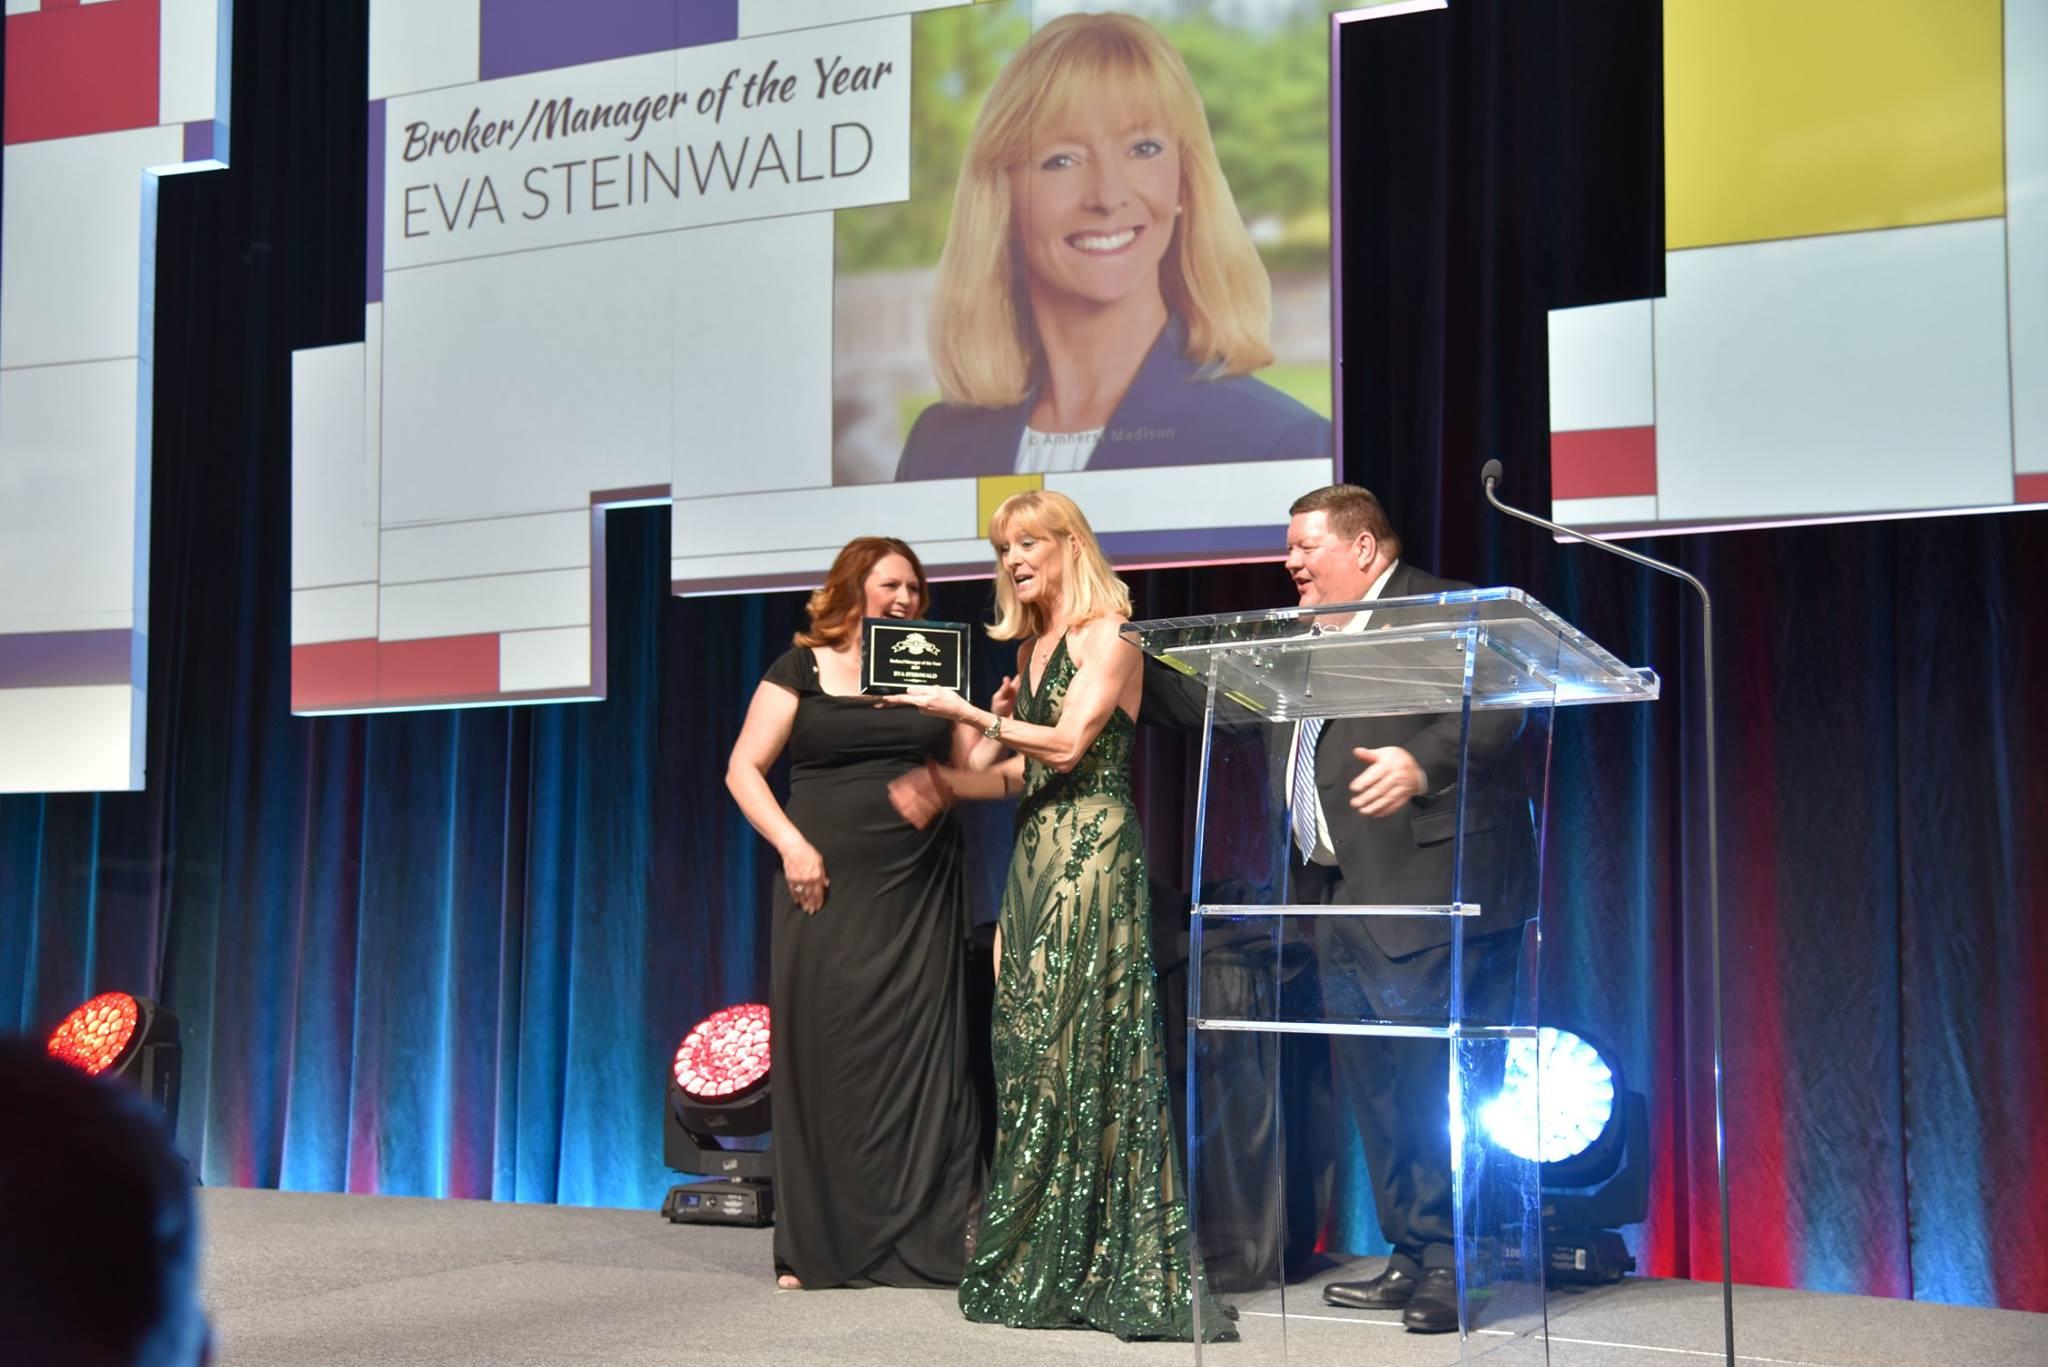 Eva-Steinwald-Broker-of-the-Year-BRR-2019-Amherst-Madison